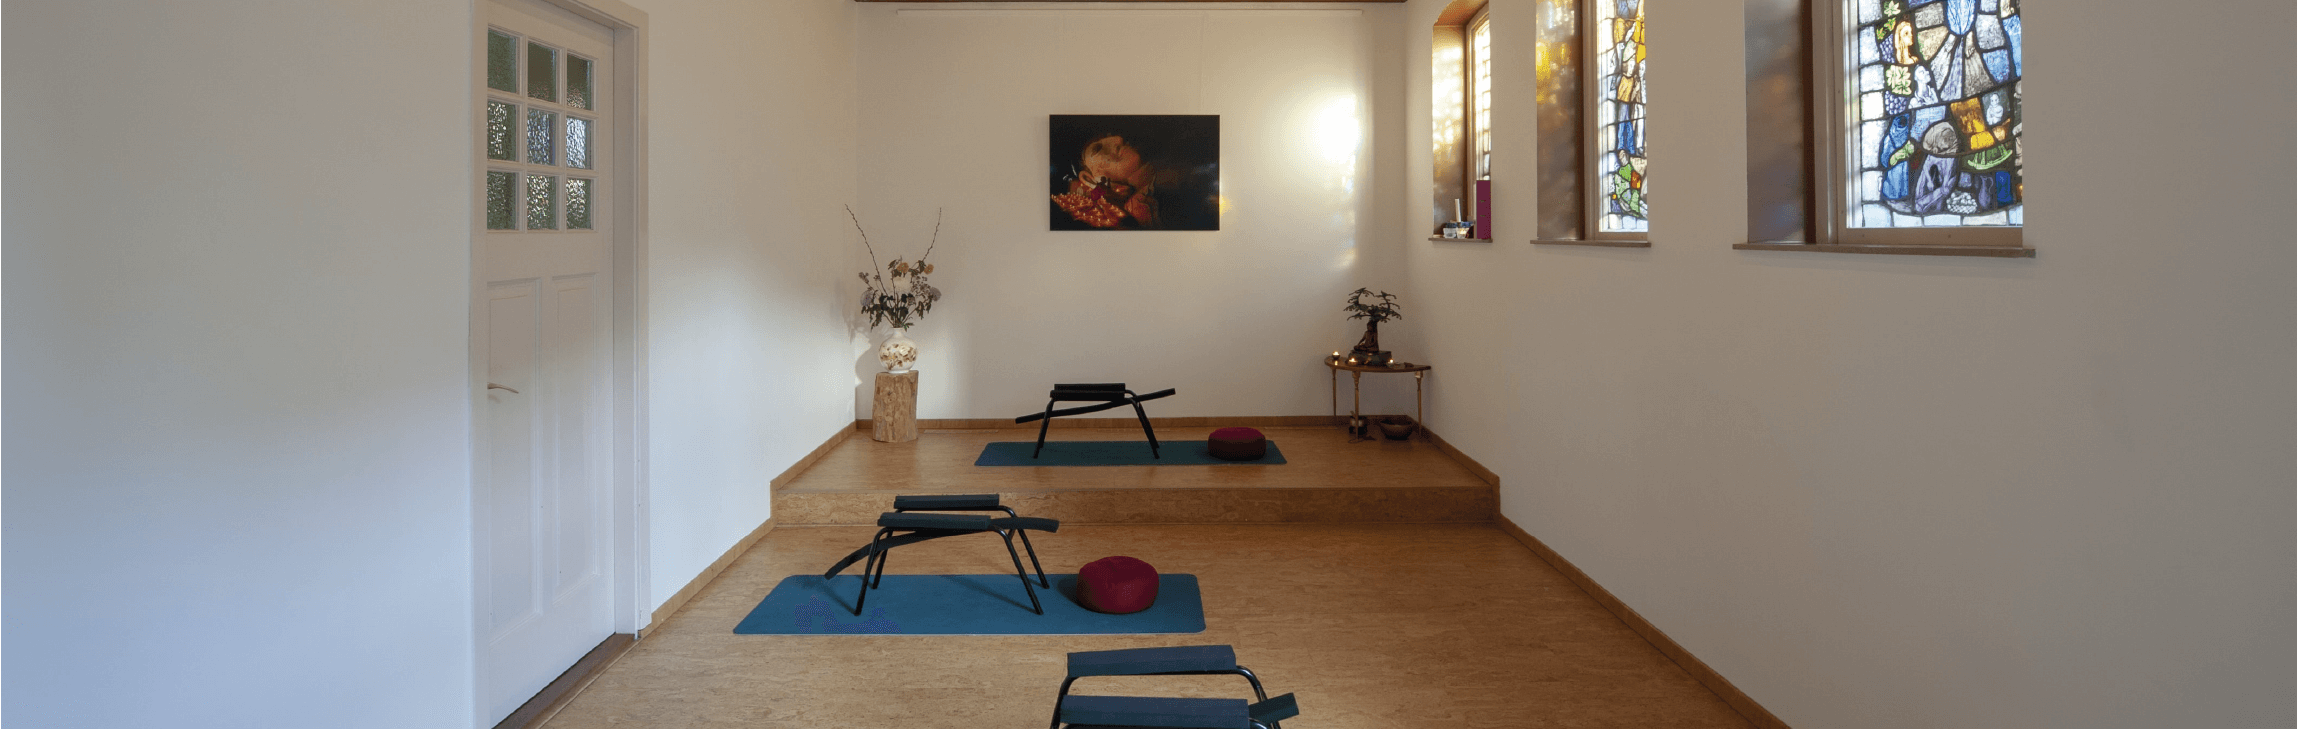 Impressie foto yoga studio